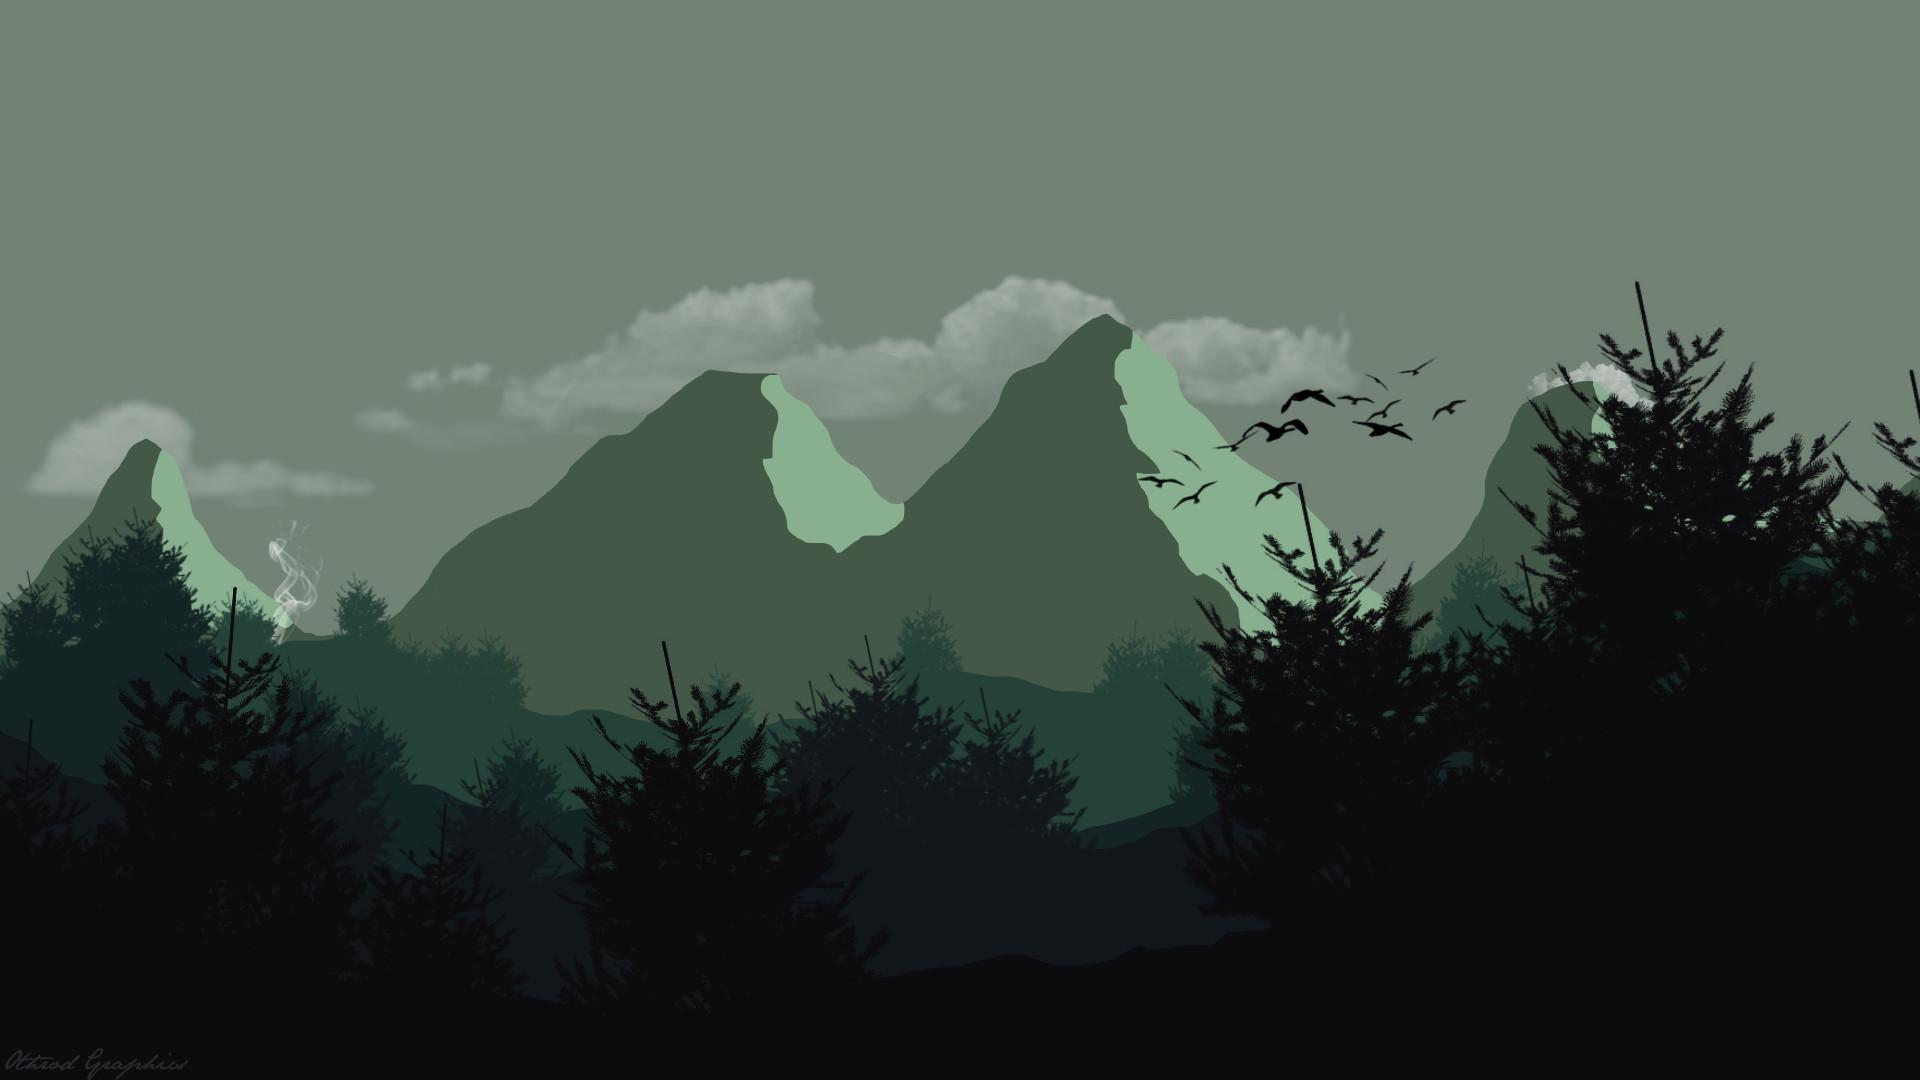 flat design wallpaper,nature,mountainous landforms,sky,mountain,mountain range